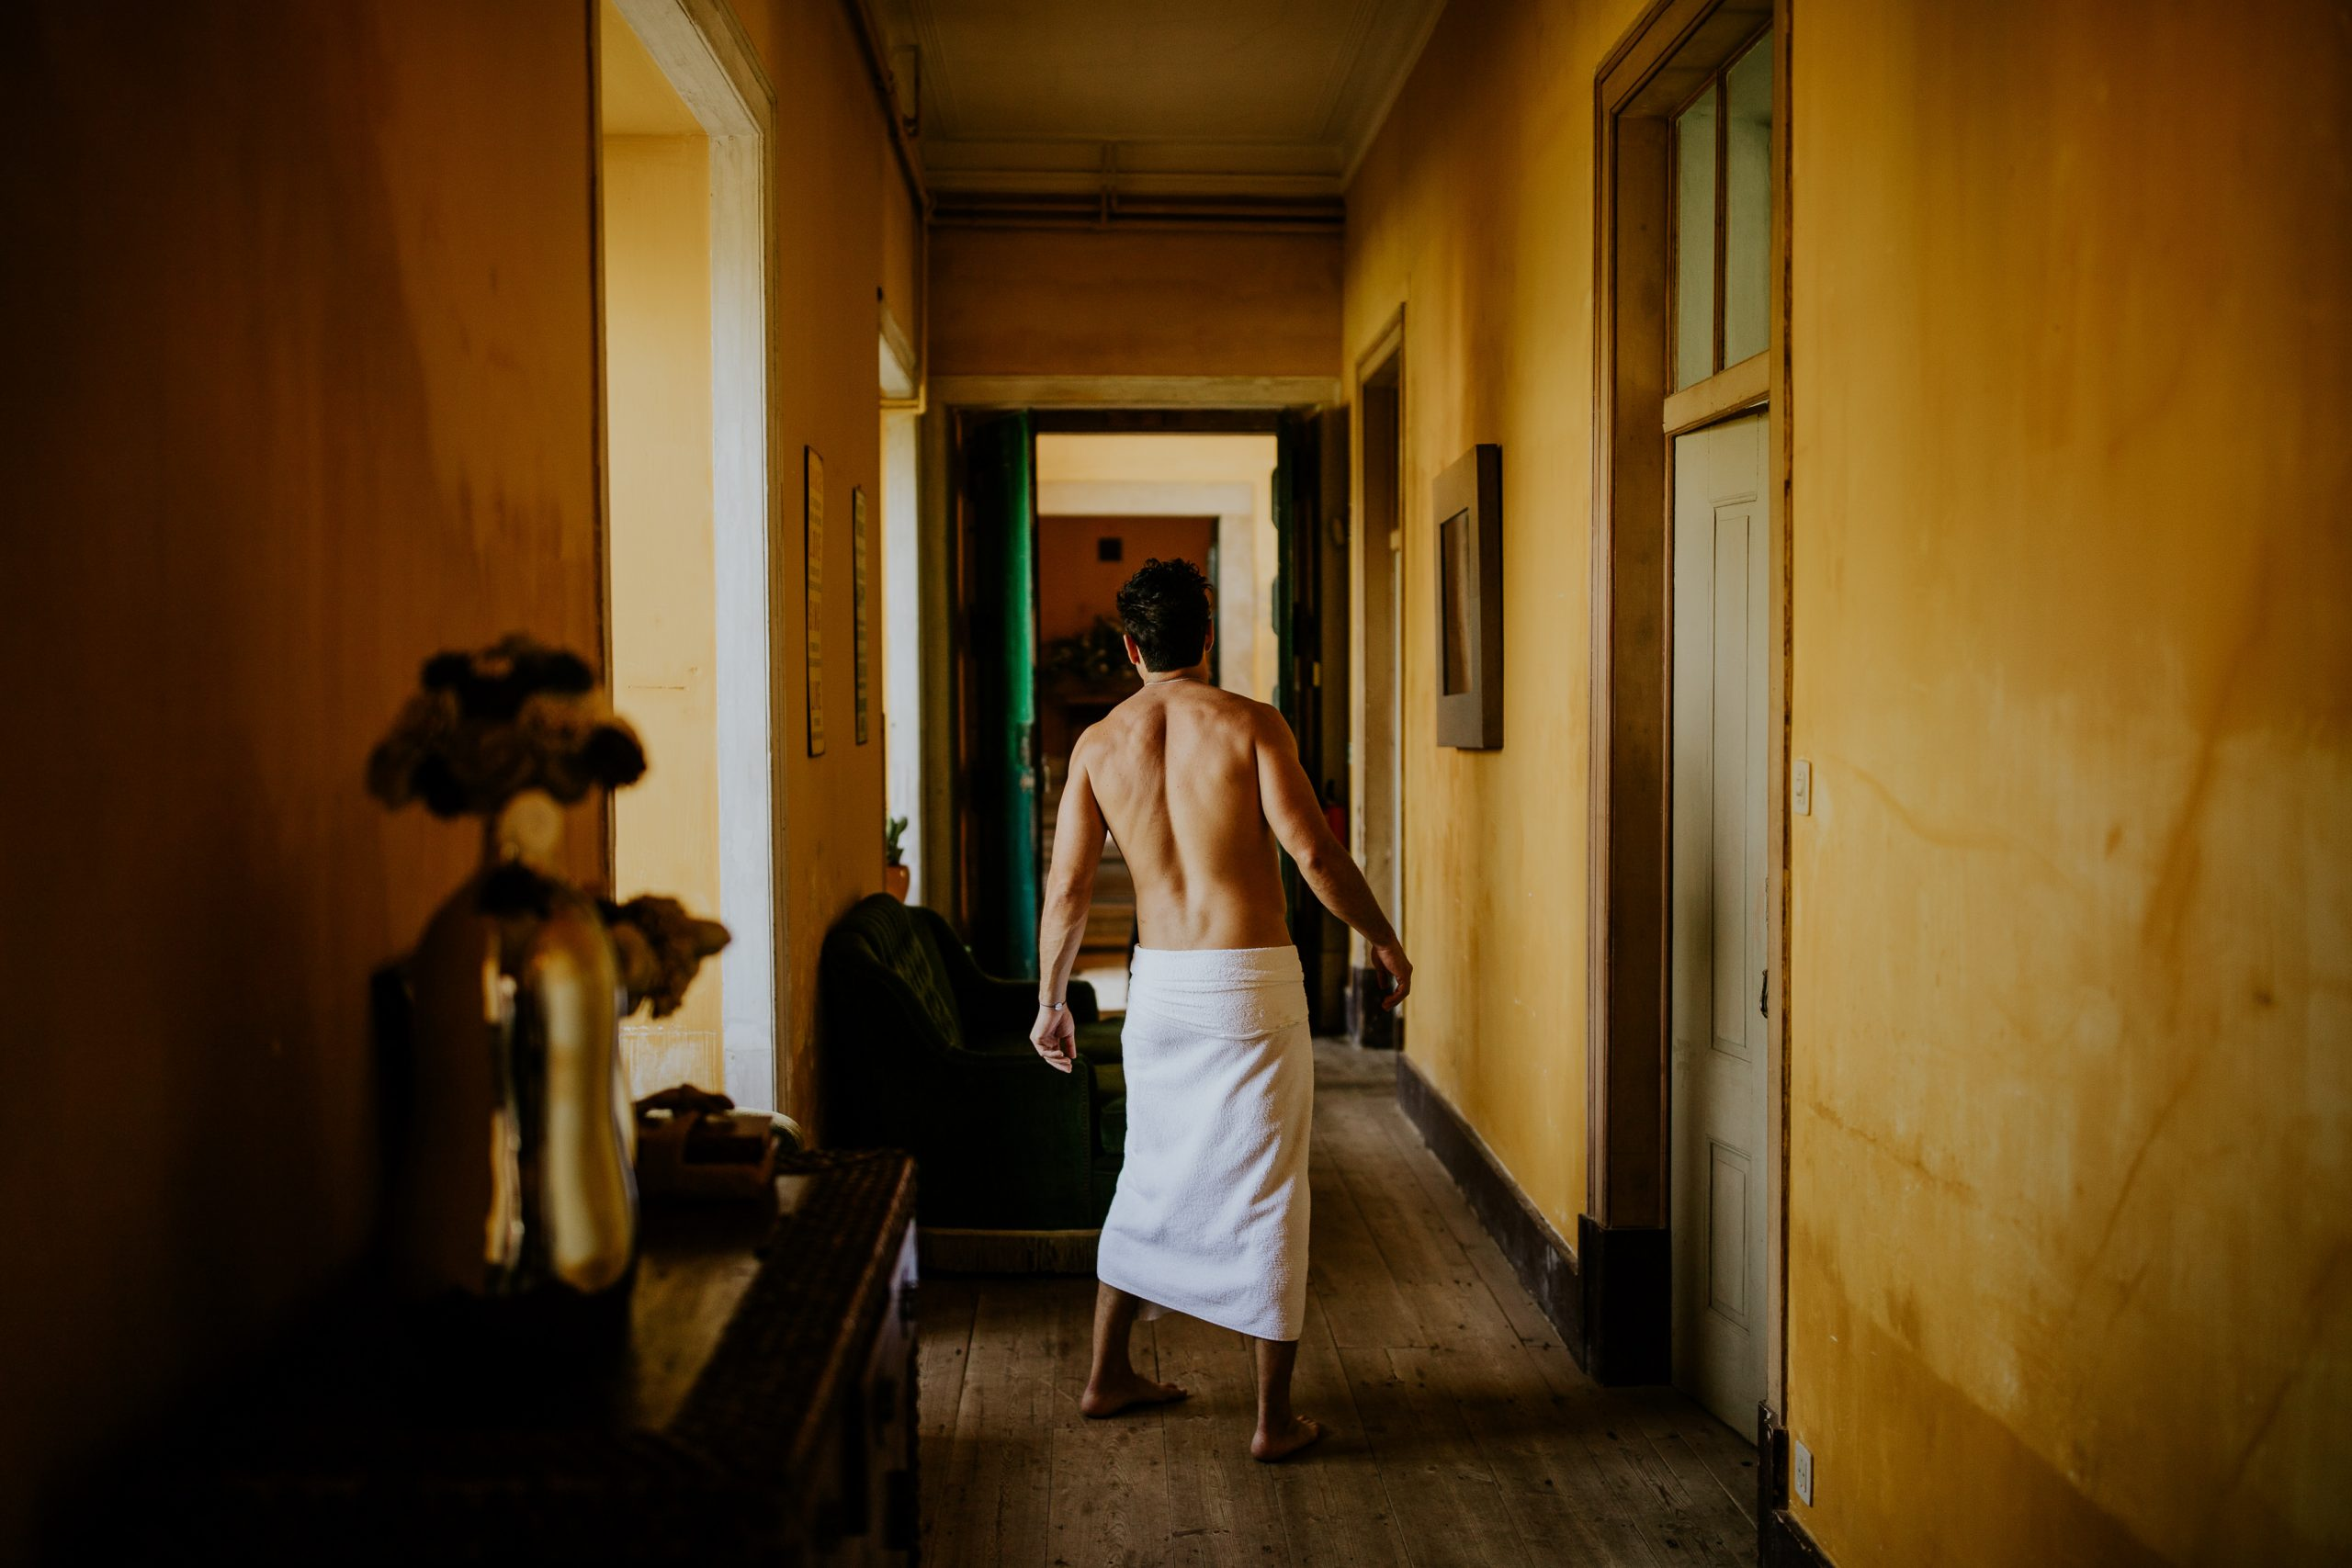 man half naked on the corridor with the bath towel